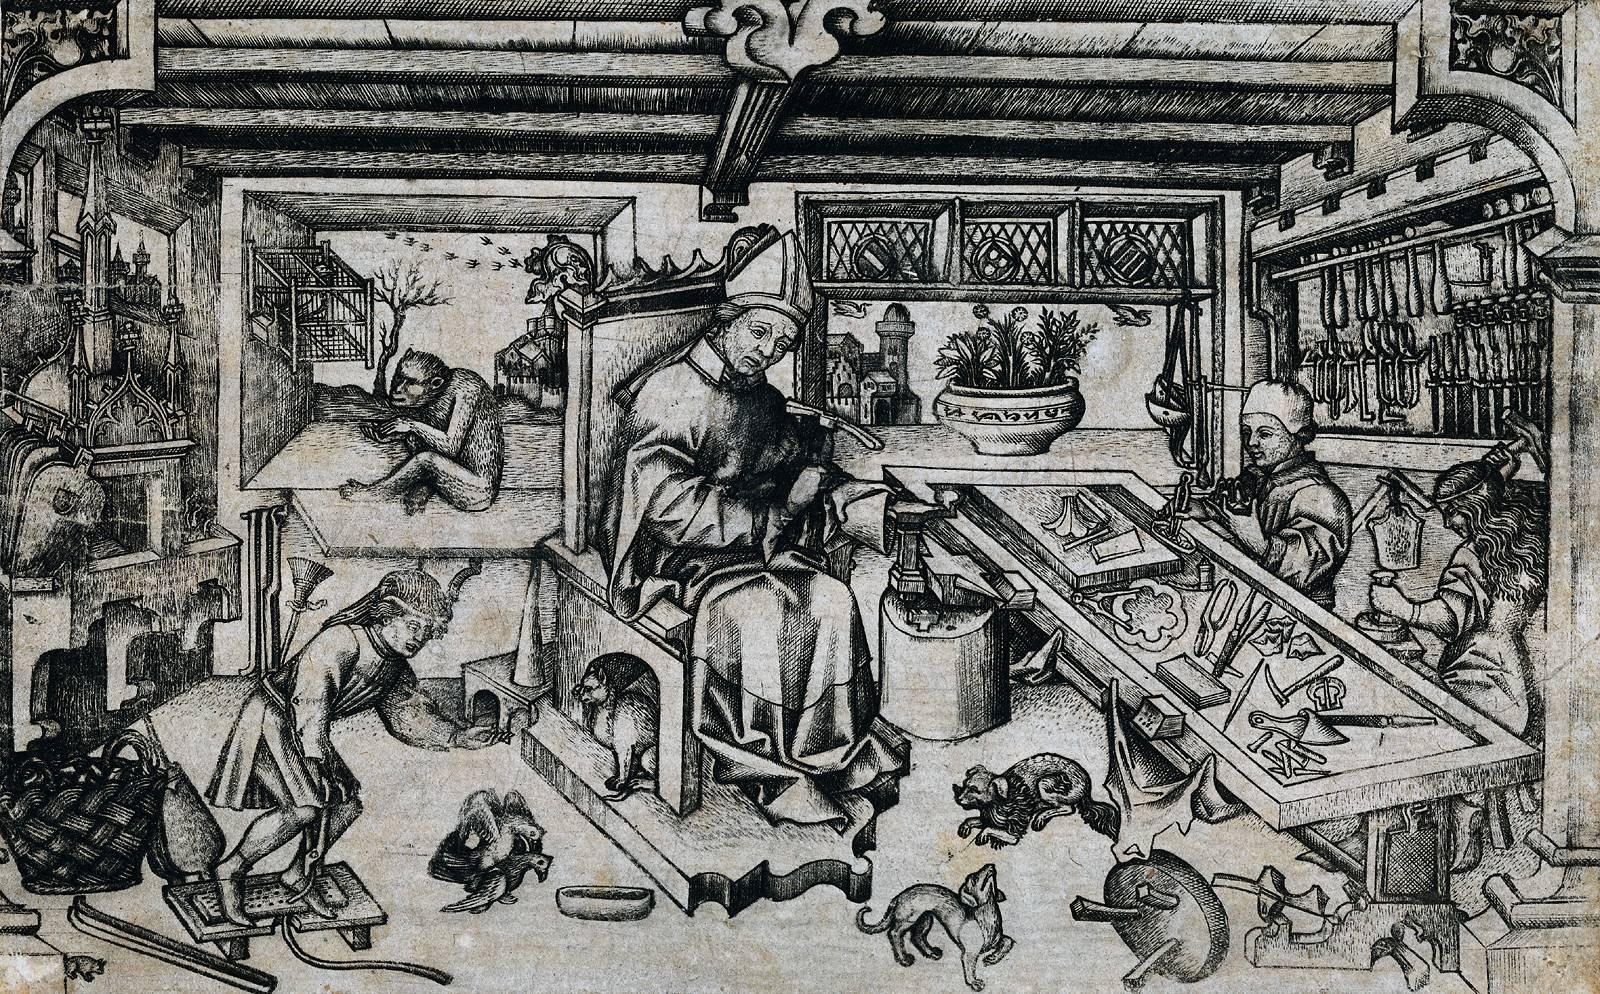 L'orfebreria medieval. Art o artesania? Foto: Wikimedia Commons